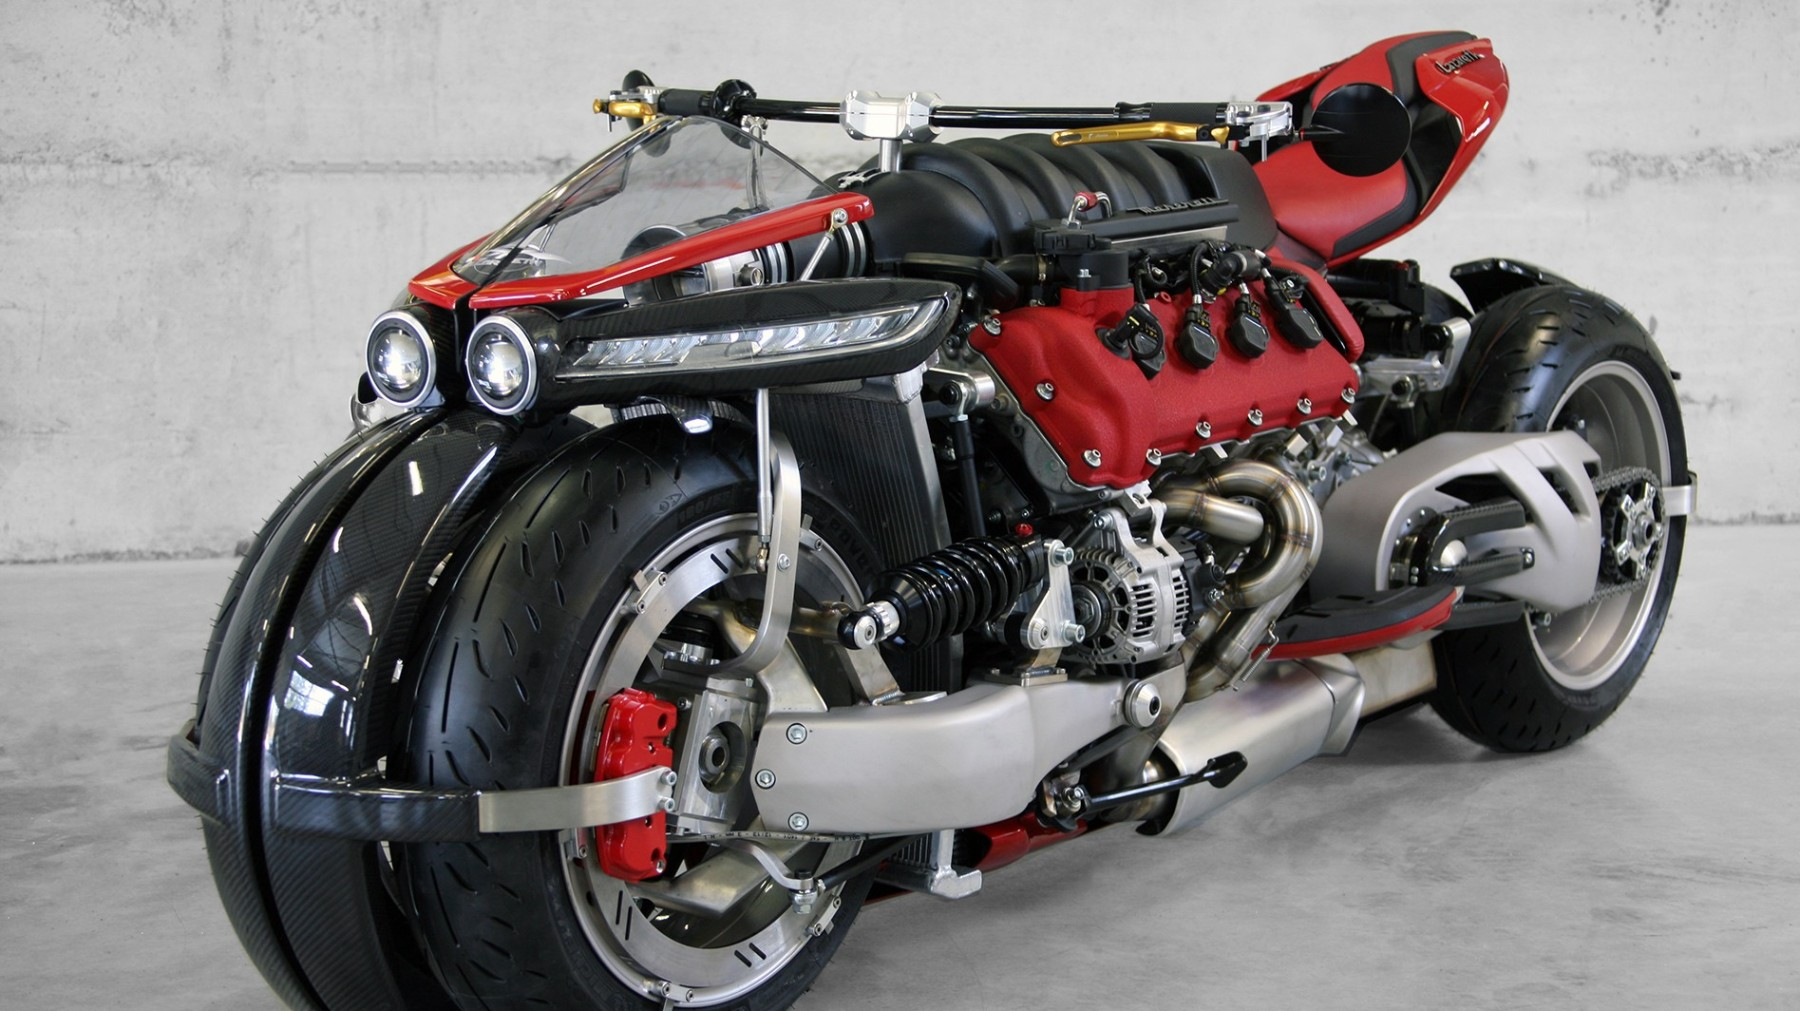 Lazareth Bike with a Maserati Engine